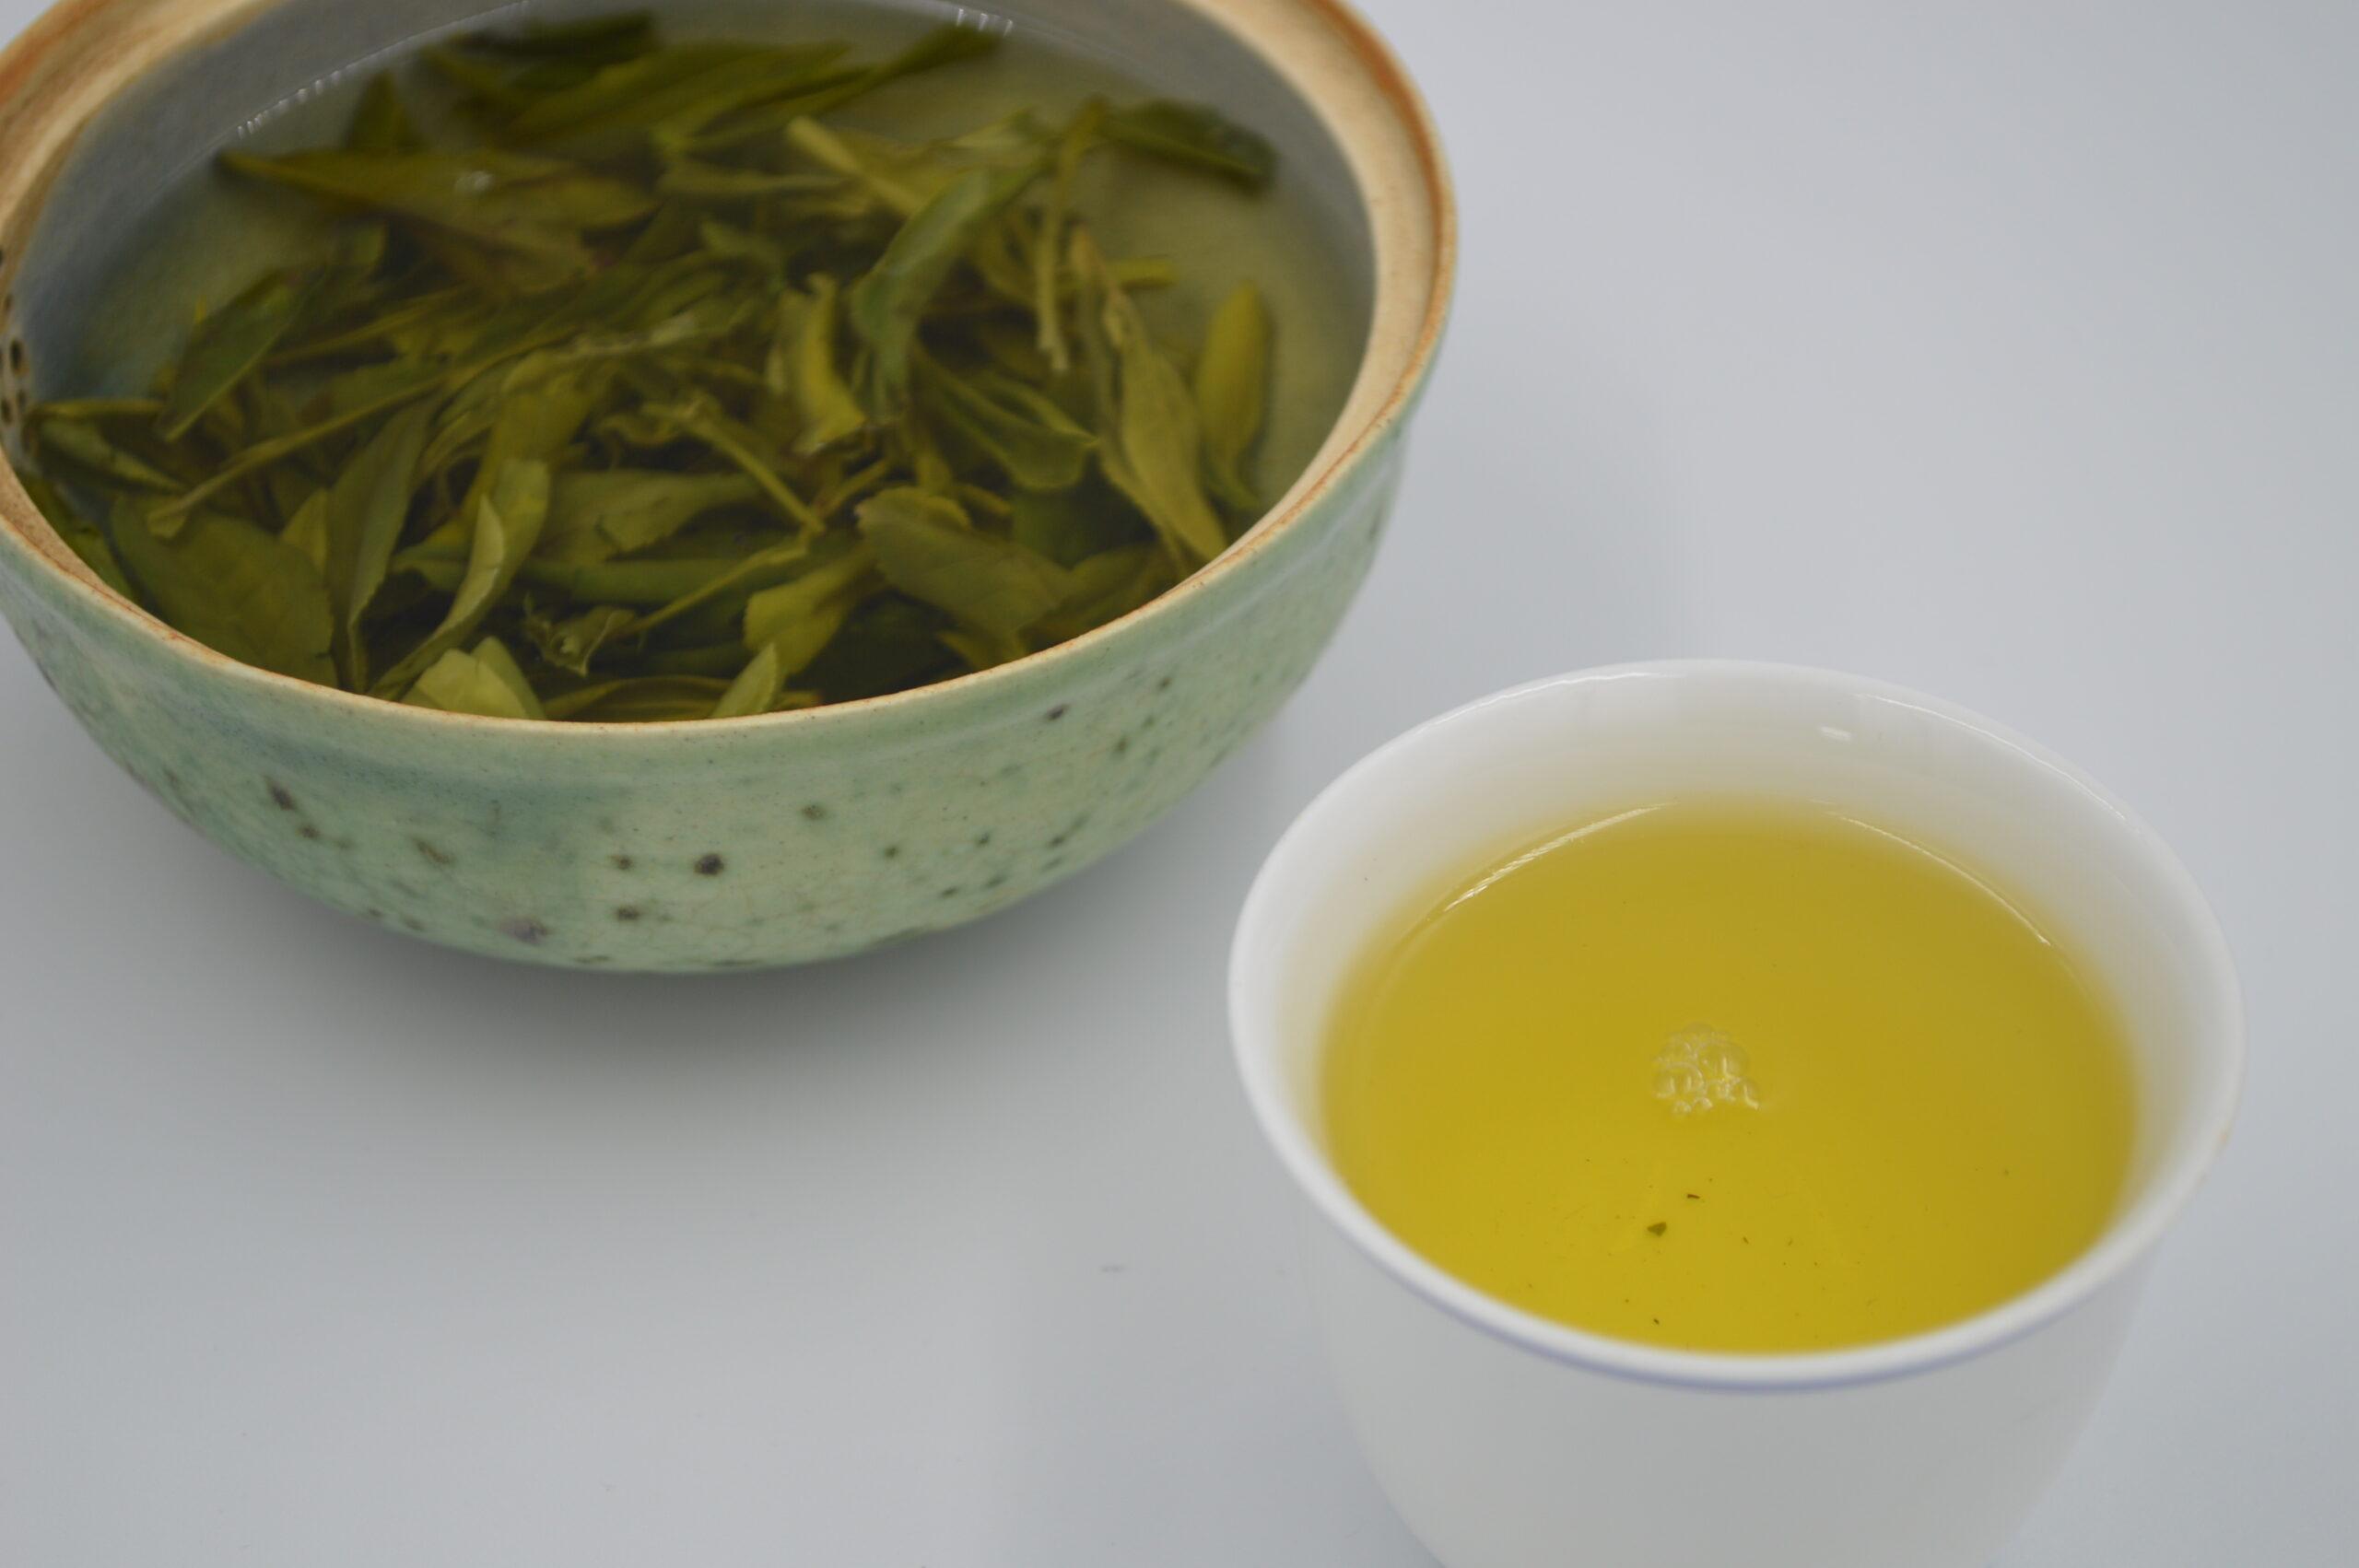 https://shop.liu-tea-art.com/wp-content/uploads/2021/05/DSC_0006-2-scaled.jpg